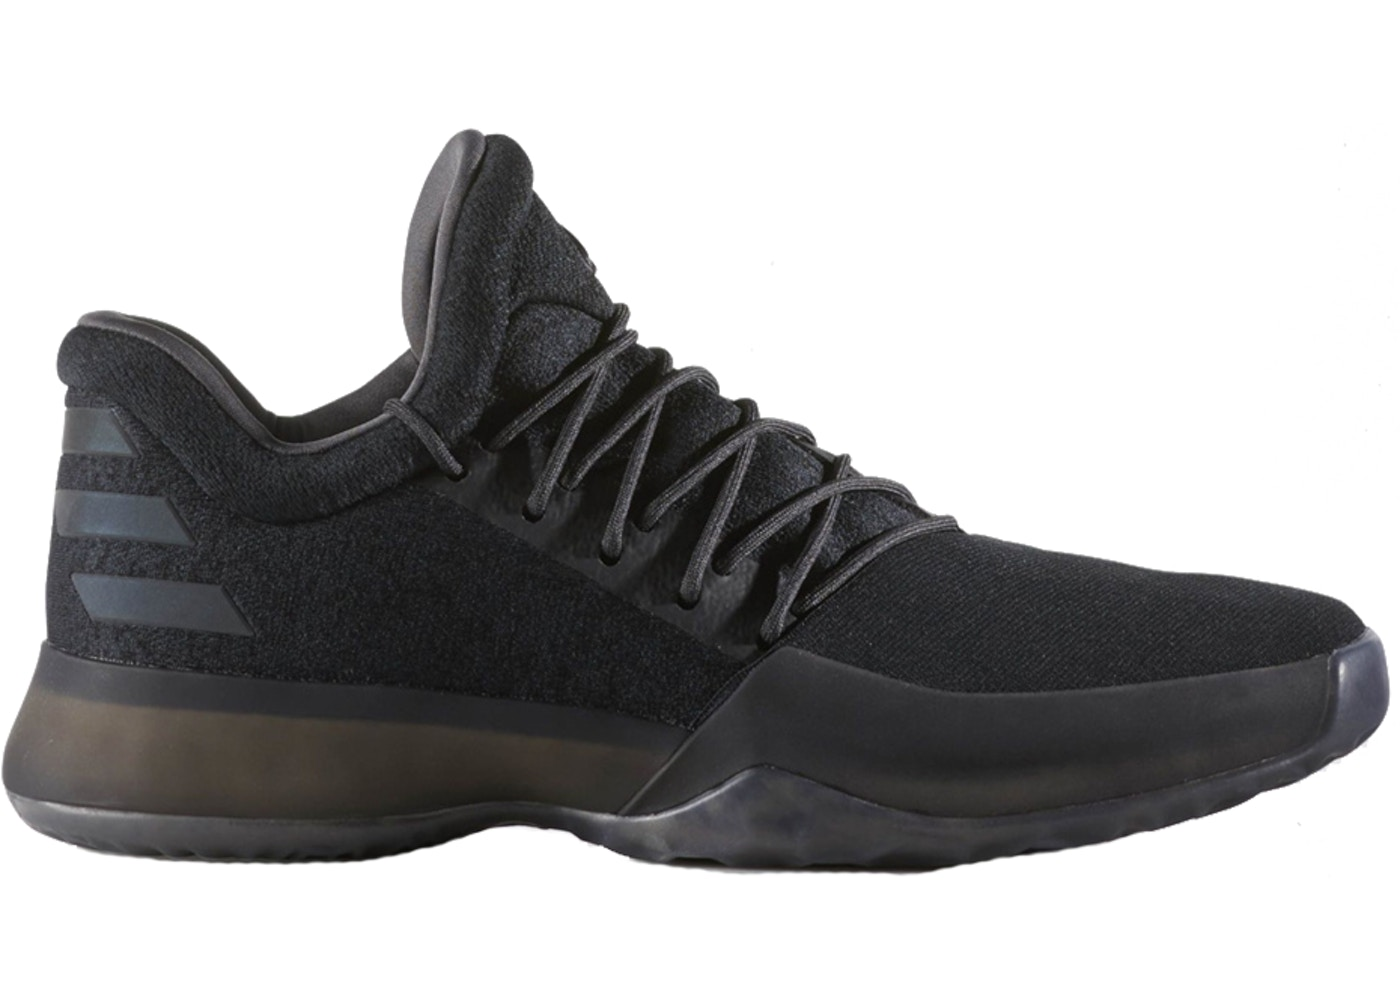 competitive price a8781 a445e adidas Harden Vol. 1  Dark Ops Xeno  Core Black For Sale.   Adidas ...